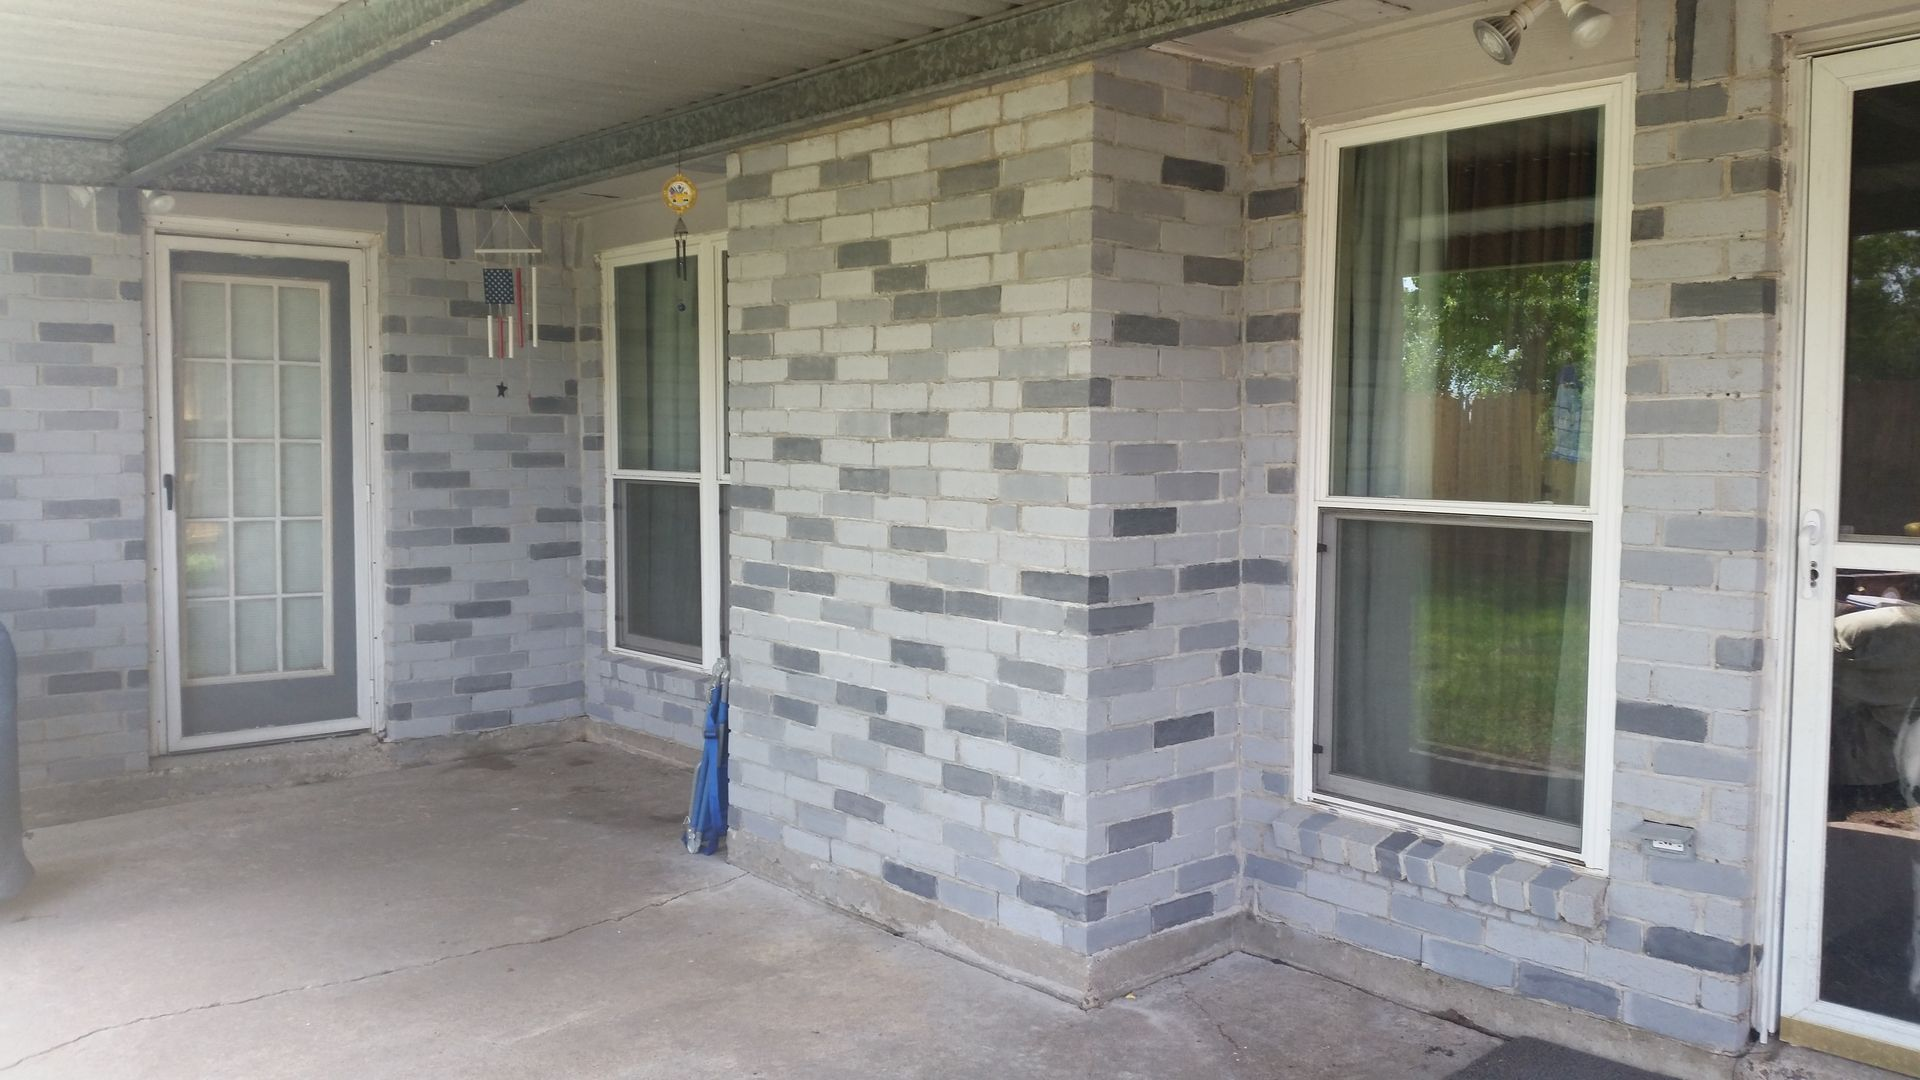 Brick Cleaning Brick Staining Brick Improvement Ideas